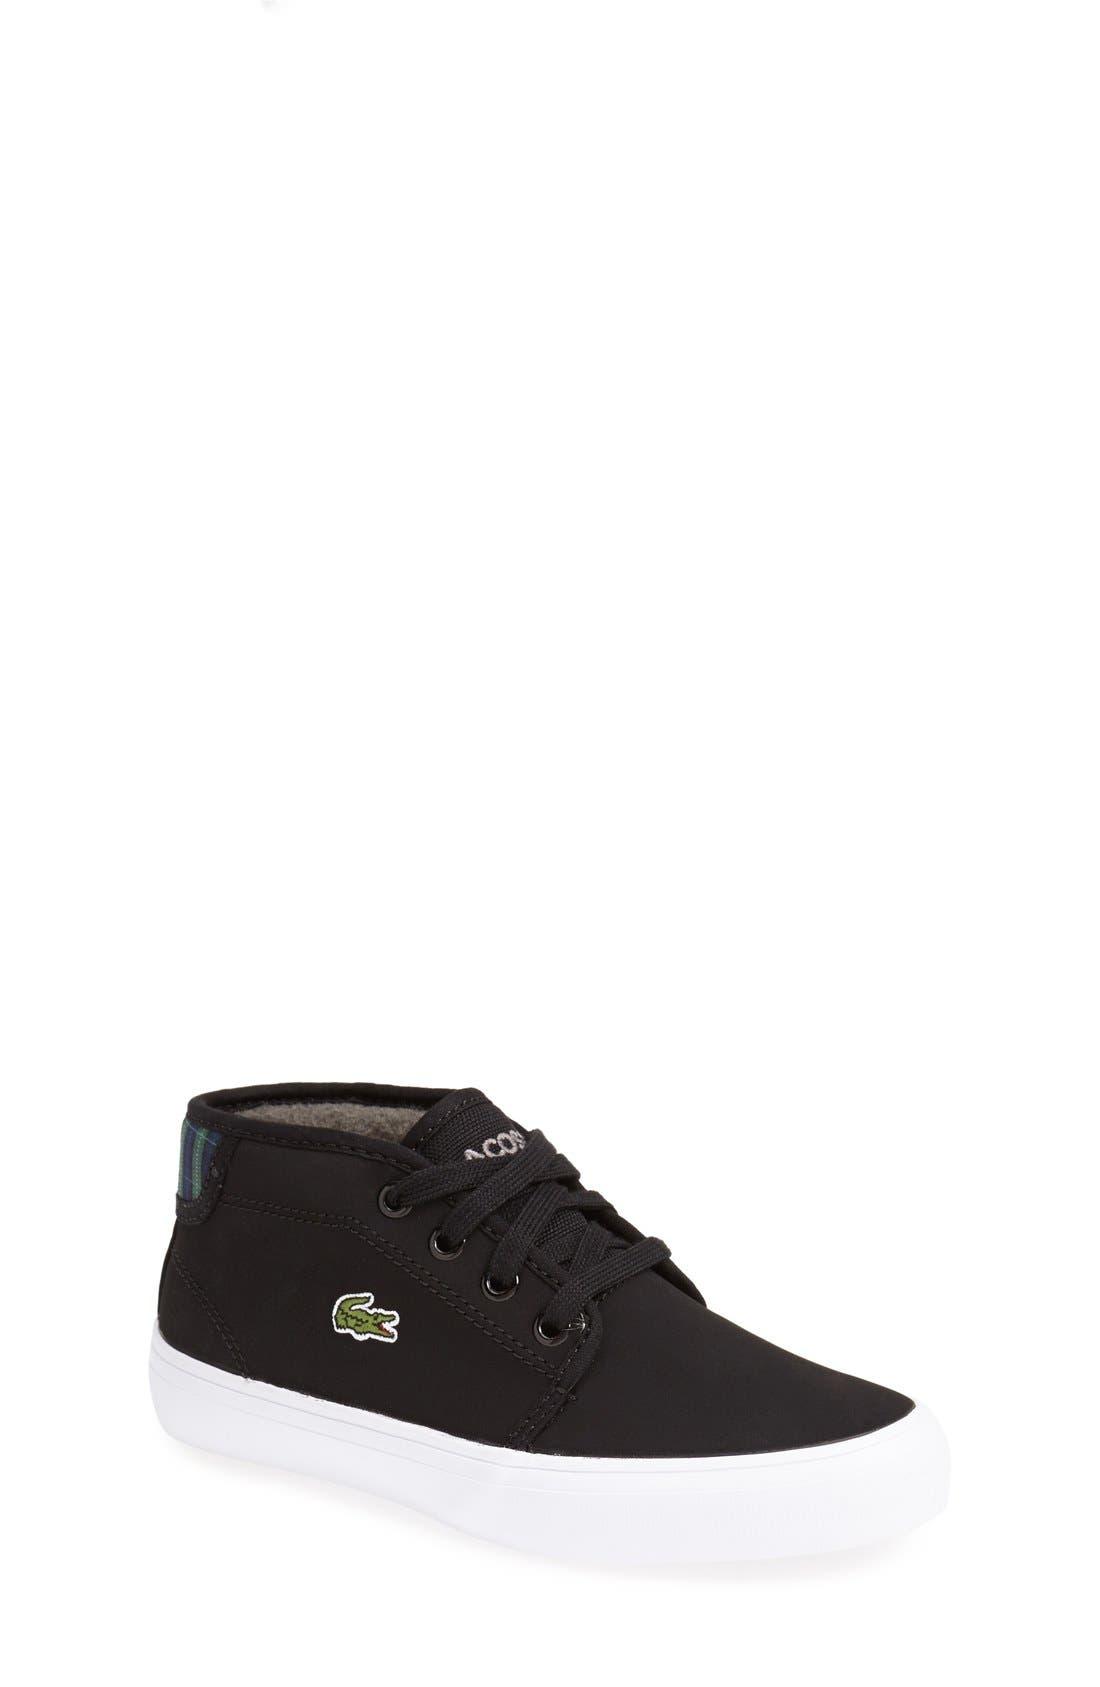 Lacoste 'Ampthill' Chukka Sneaker